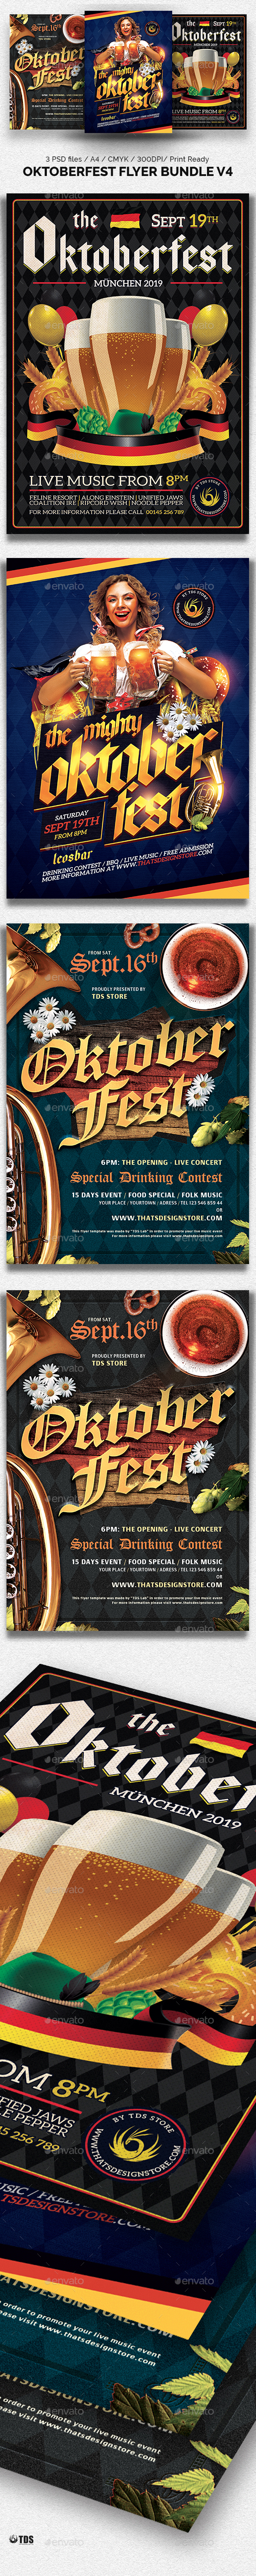 Oktoberfest Flyer Bundle V4 - Clubs & Parties Events